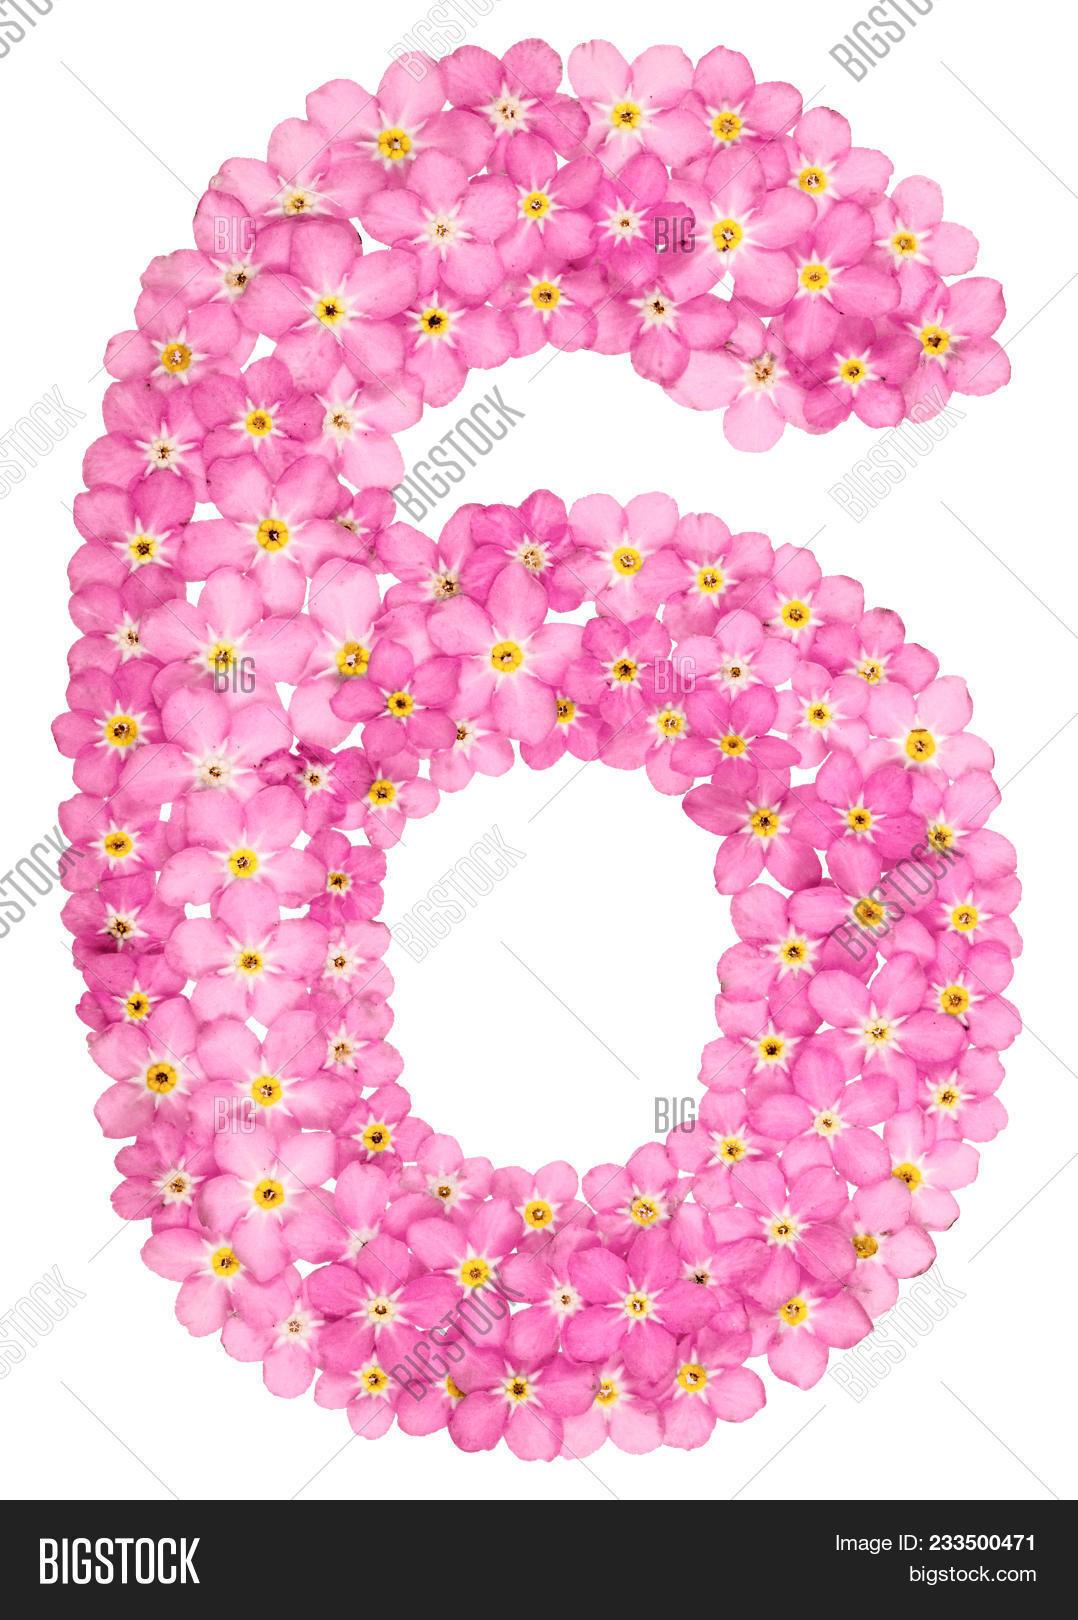 Arabic Numeral 6 Six Image Photo Free Trial Bigstock